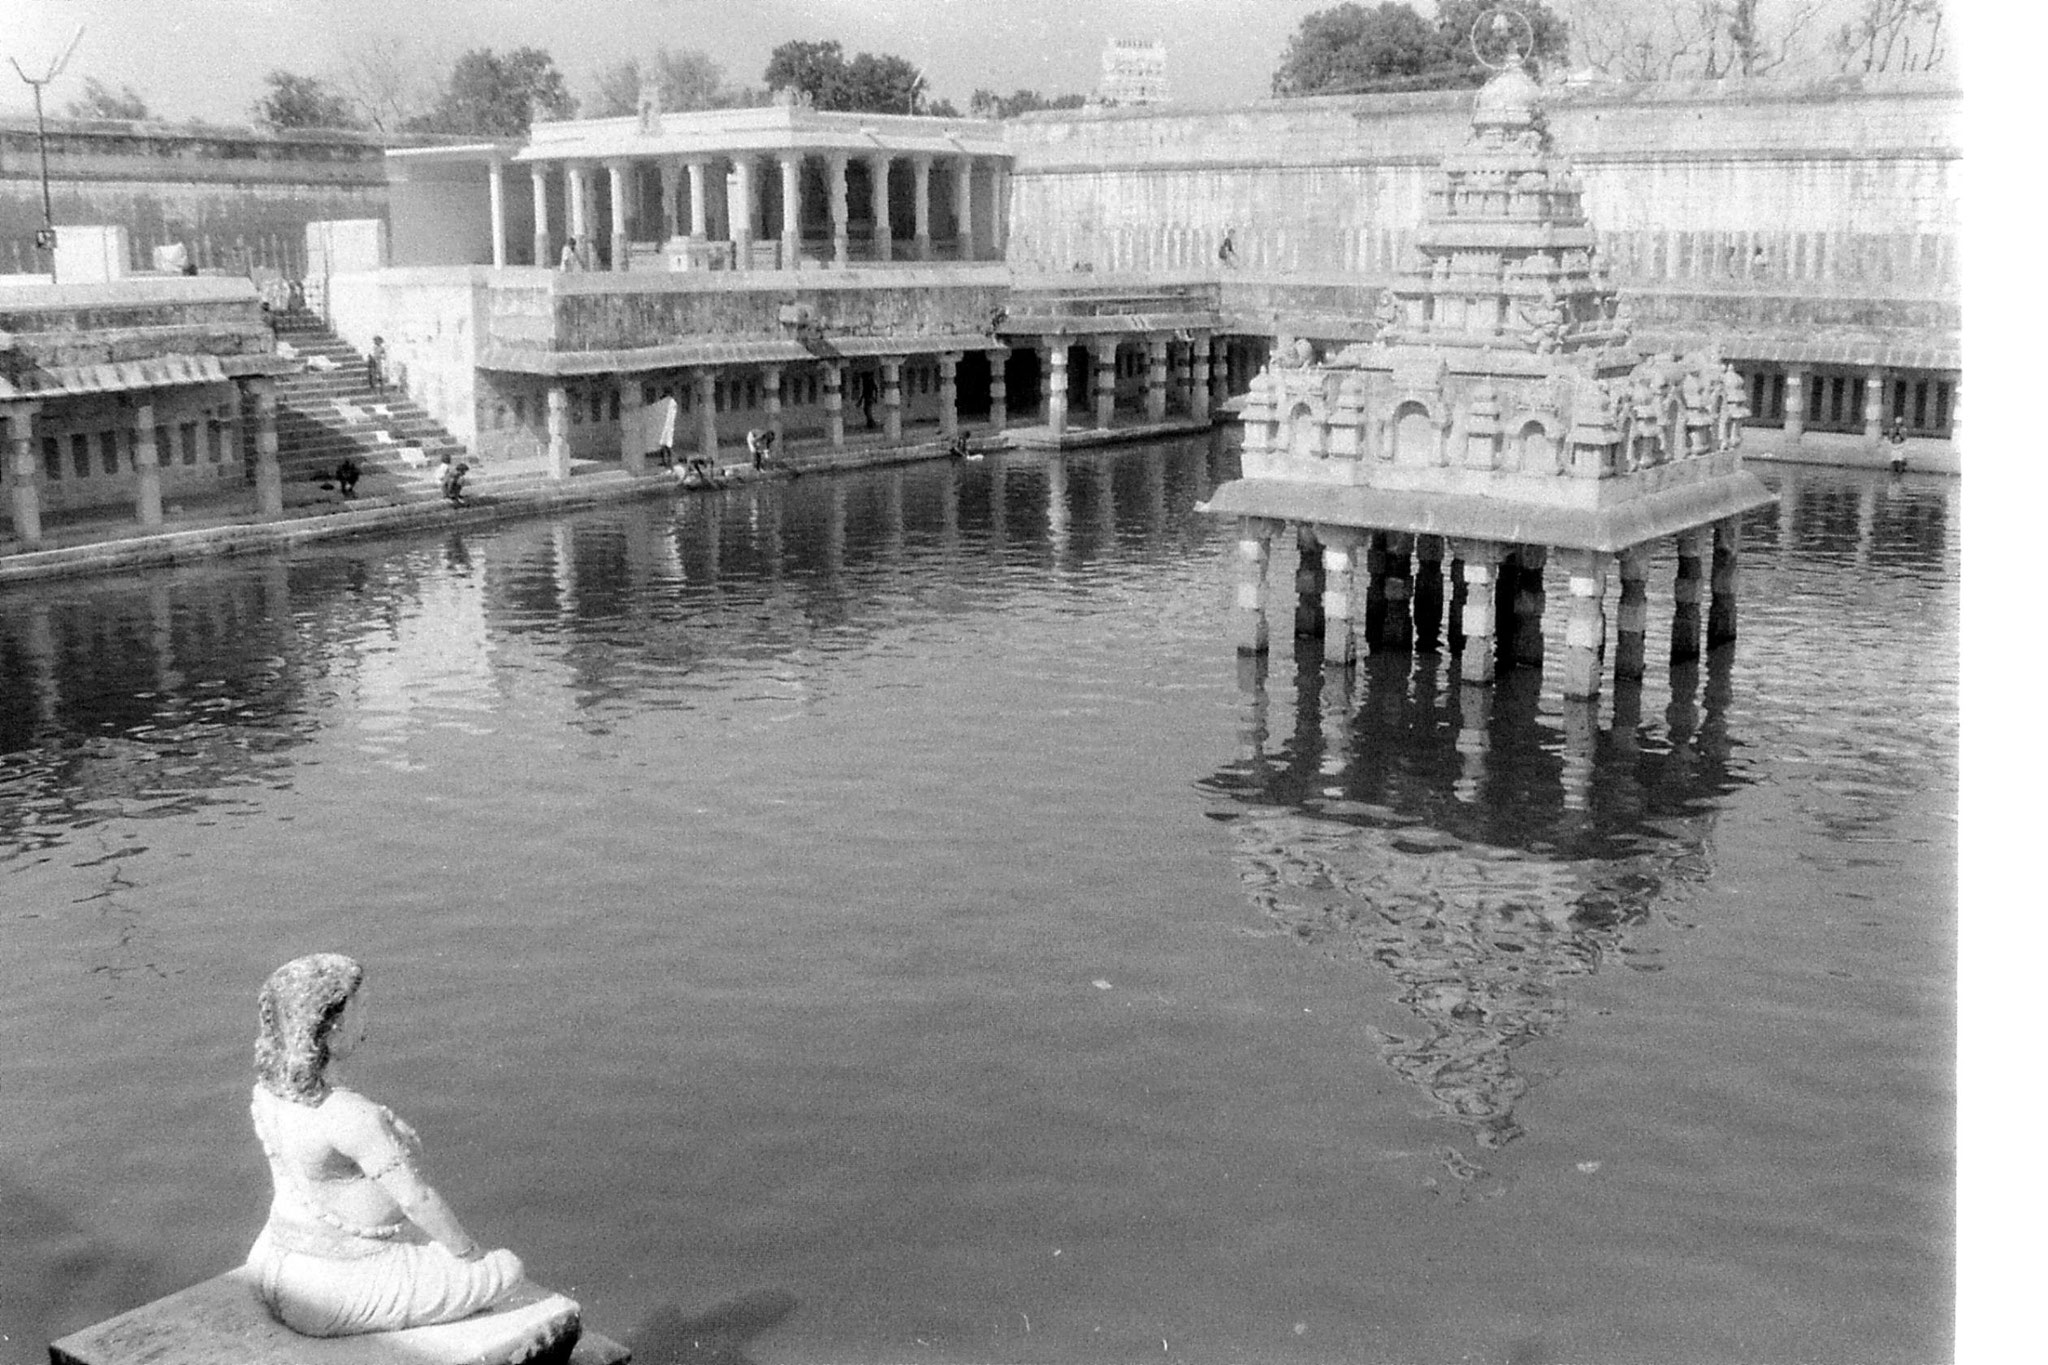 19/1/90: 17: Kanchipuram - Kamakshi temple